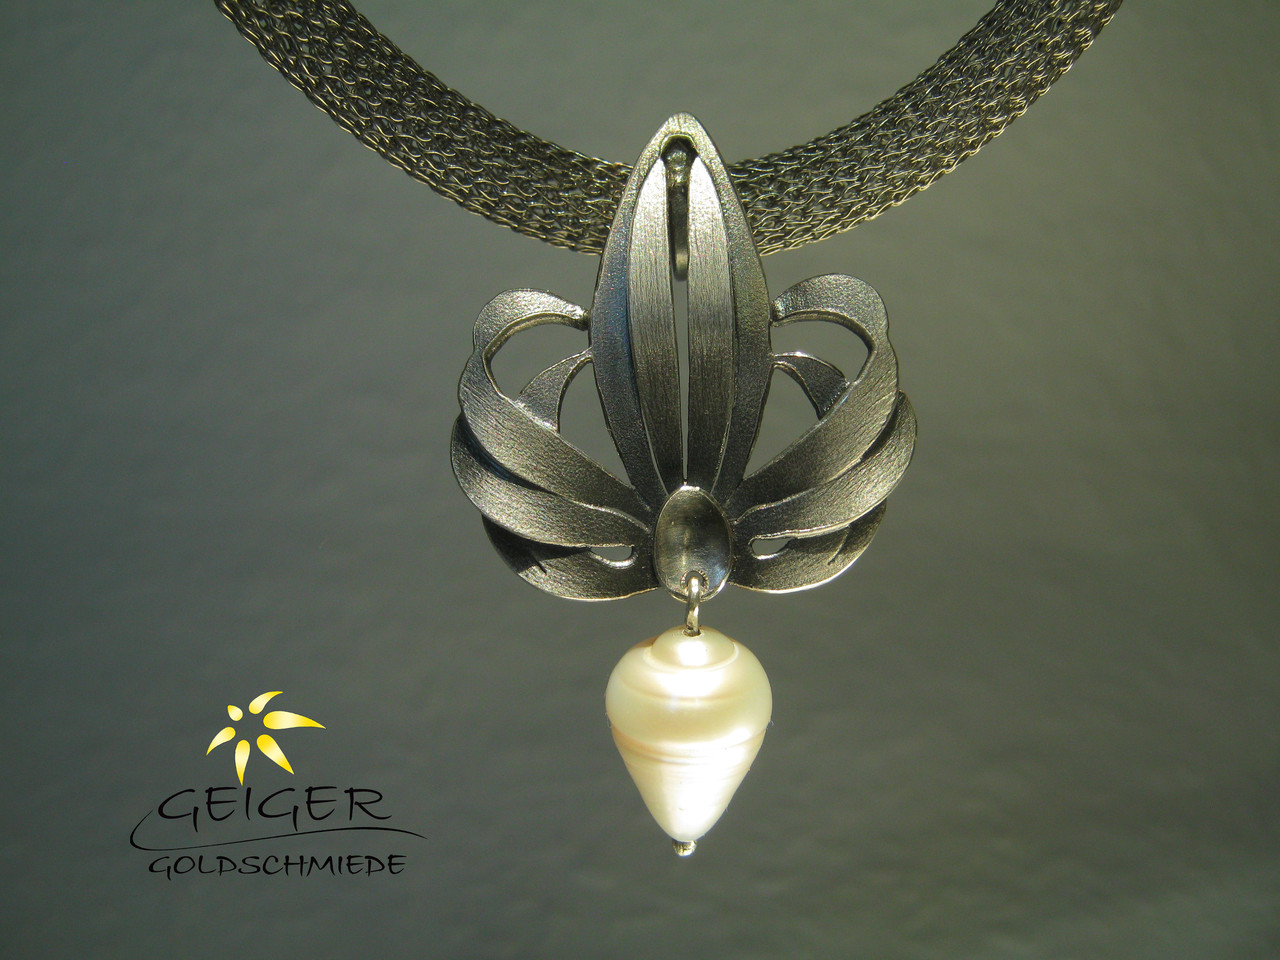 Geiger Goldschmiede Mainz Silberanhänger mit Perle Goldschmiedekunst in Formvollendung